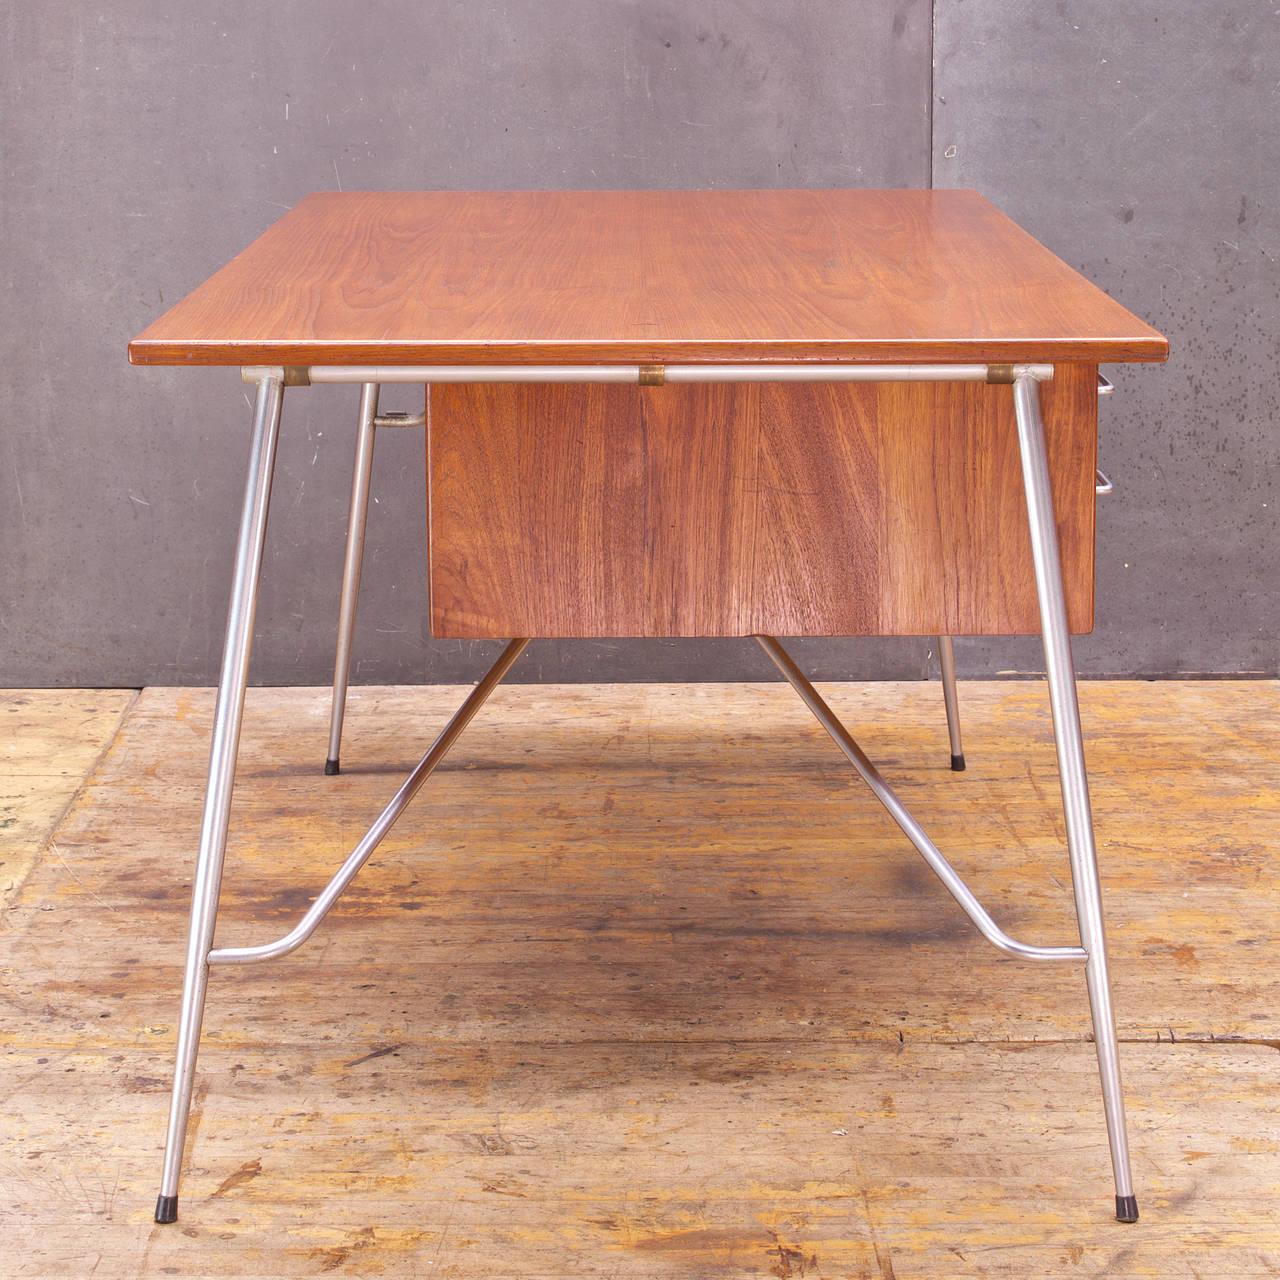 Oiled Rare Borge Mogensen Teak and Steel Desk Vintage Mid-Century Soborg Mobler For Sale